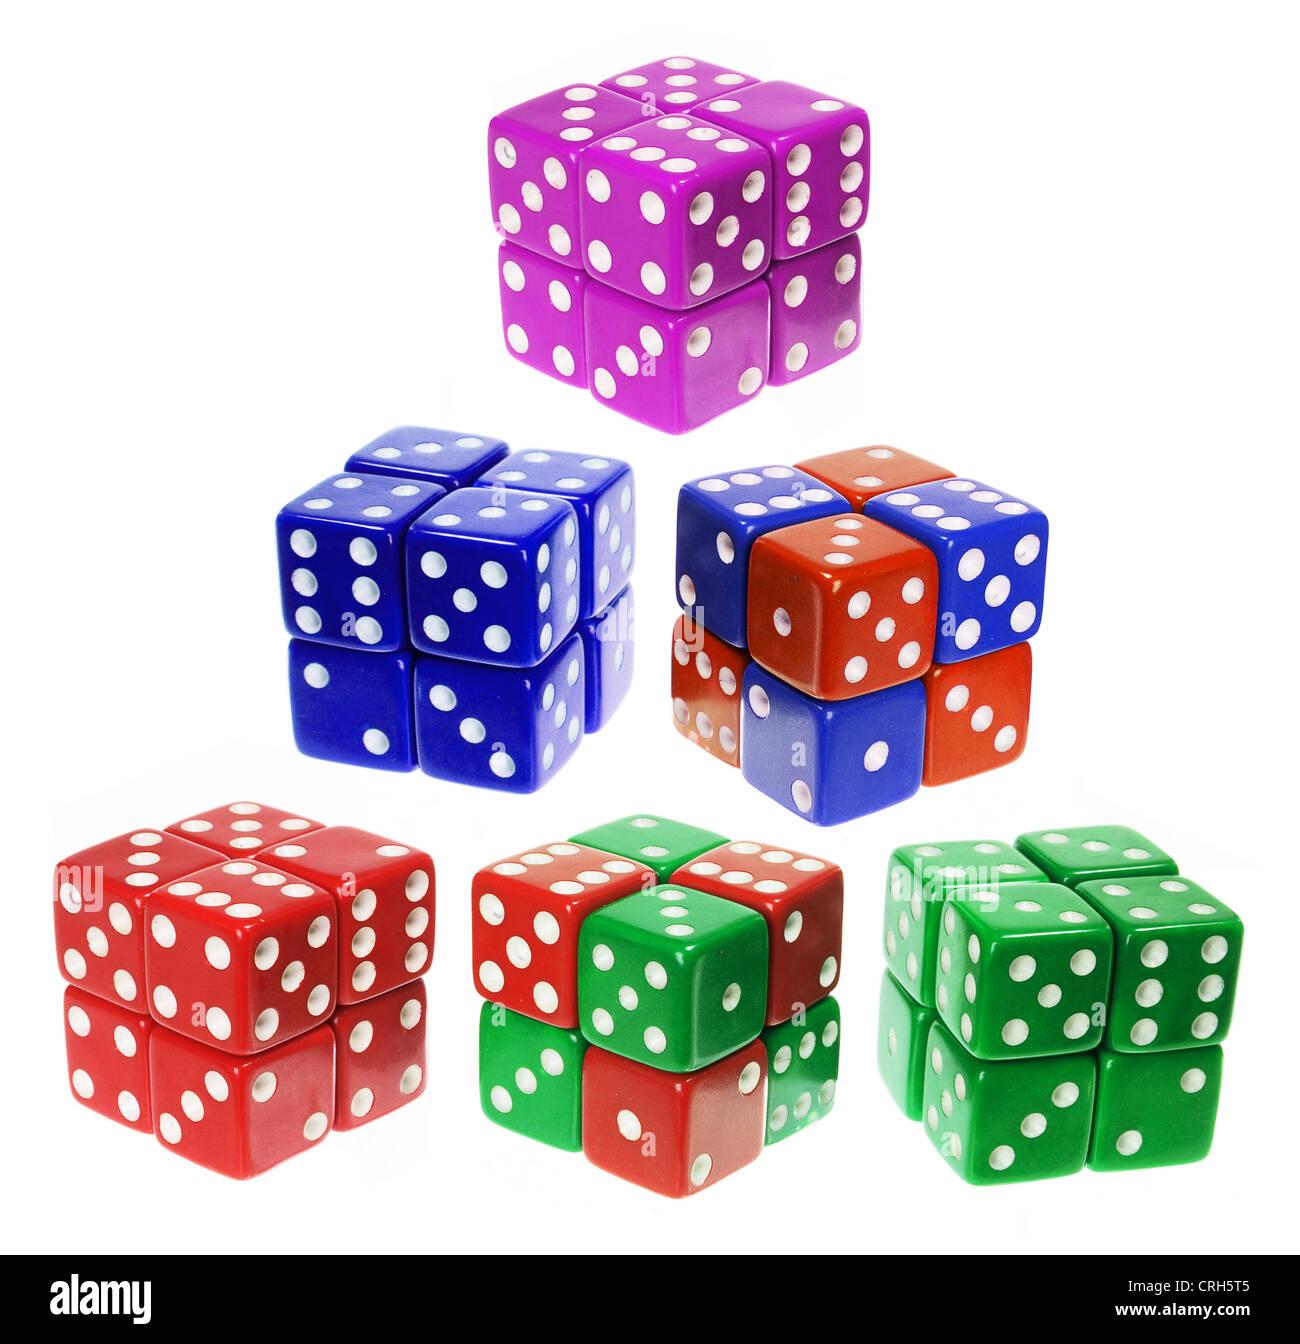 Dice Puzzle Cubes - Stock Image